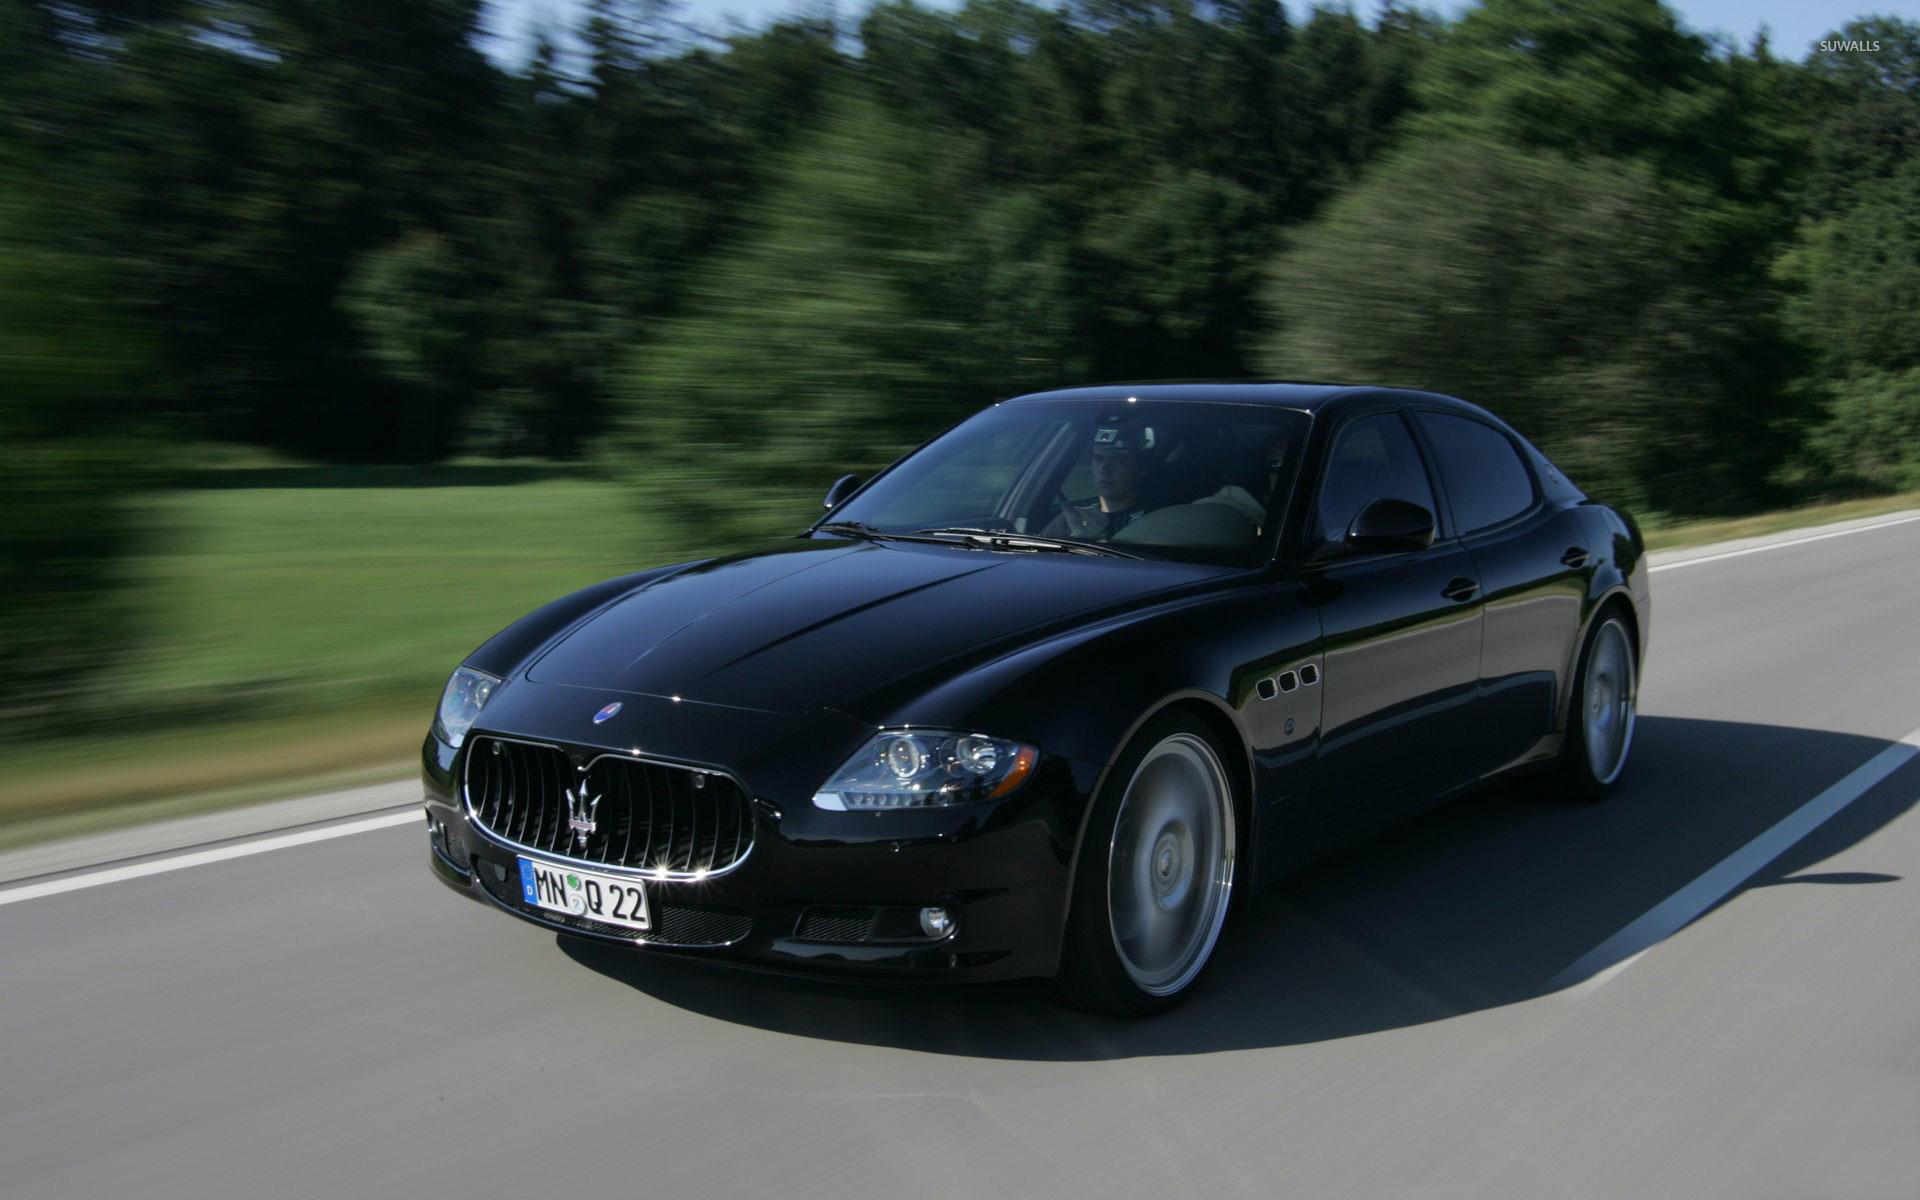 Maserati Quattroporte V 3 wallpaper - Car wallpapers ...